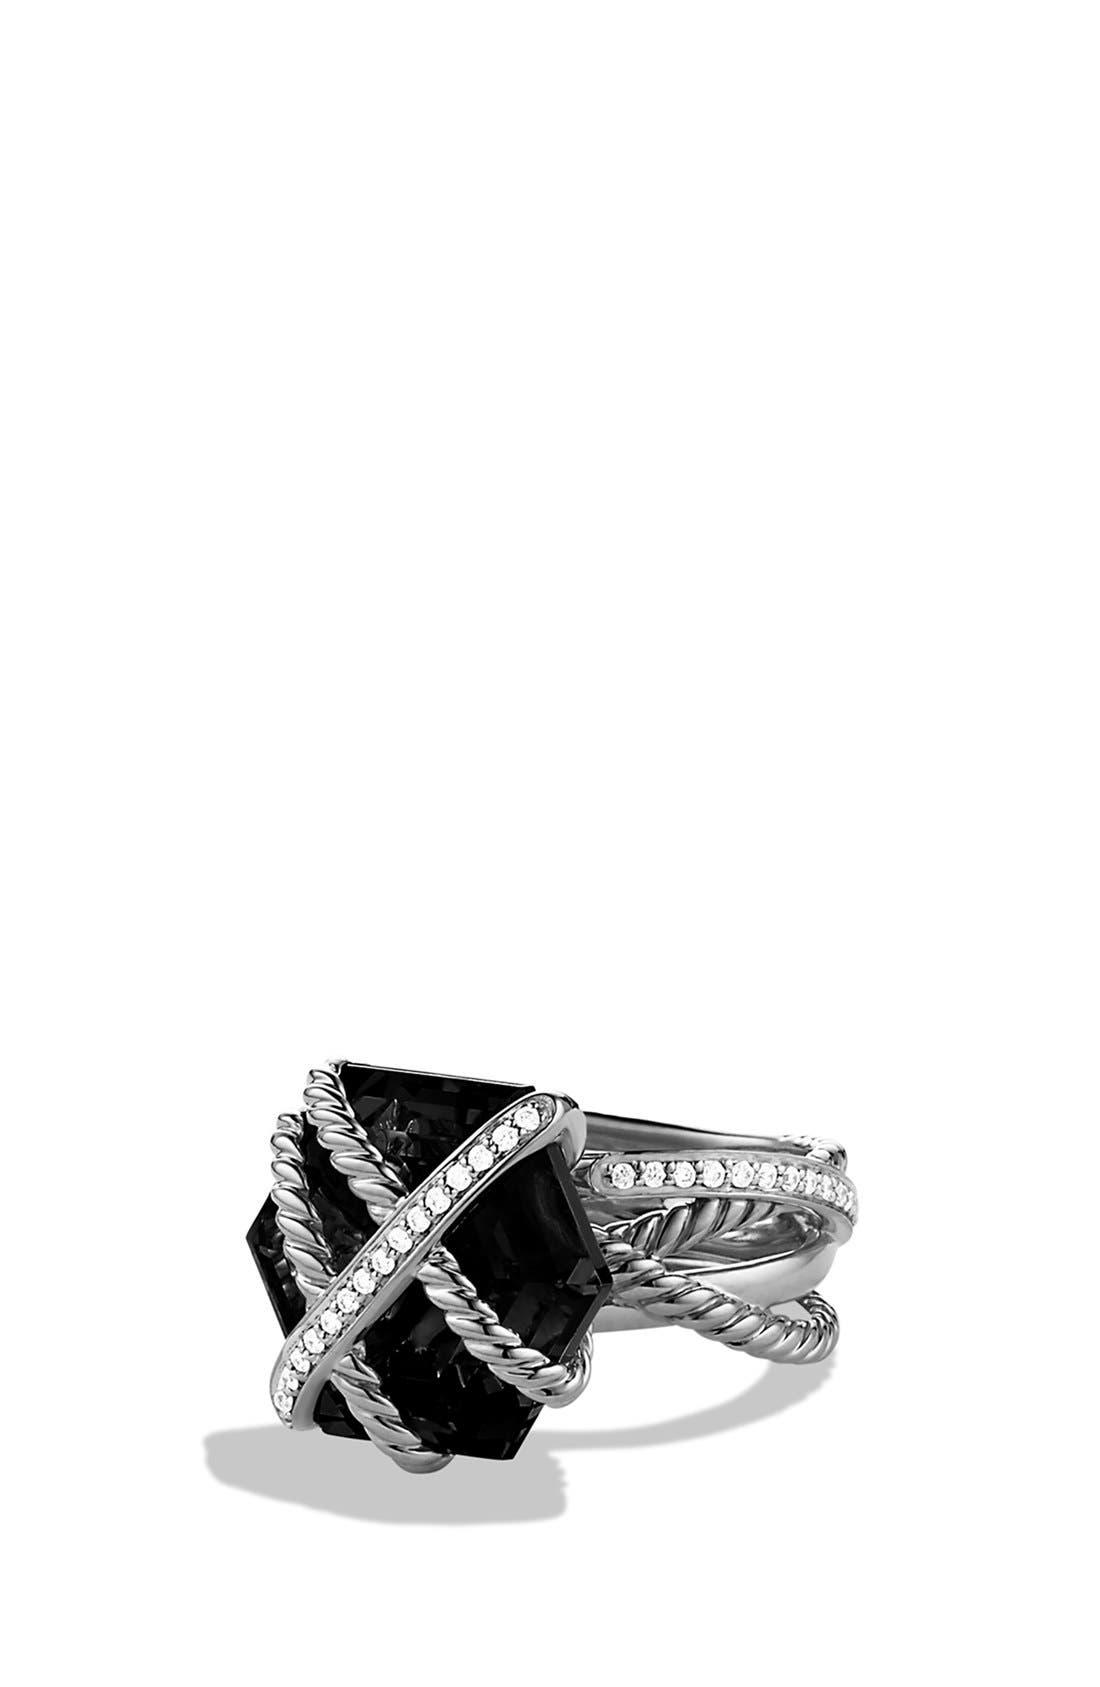 DAVID YURMAN,                             'Cable Wrap' Ring with Black Onyx and Diamonds,                             Main thumbnail 1, color,                             001